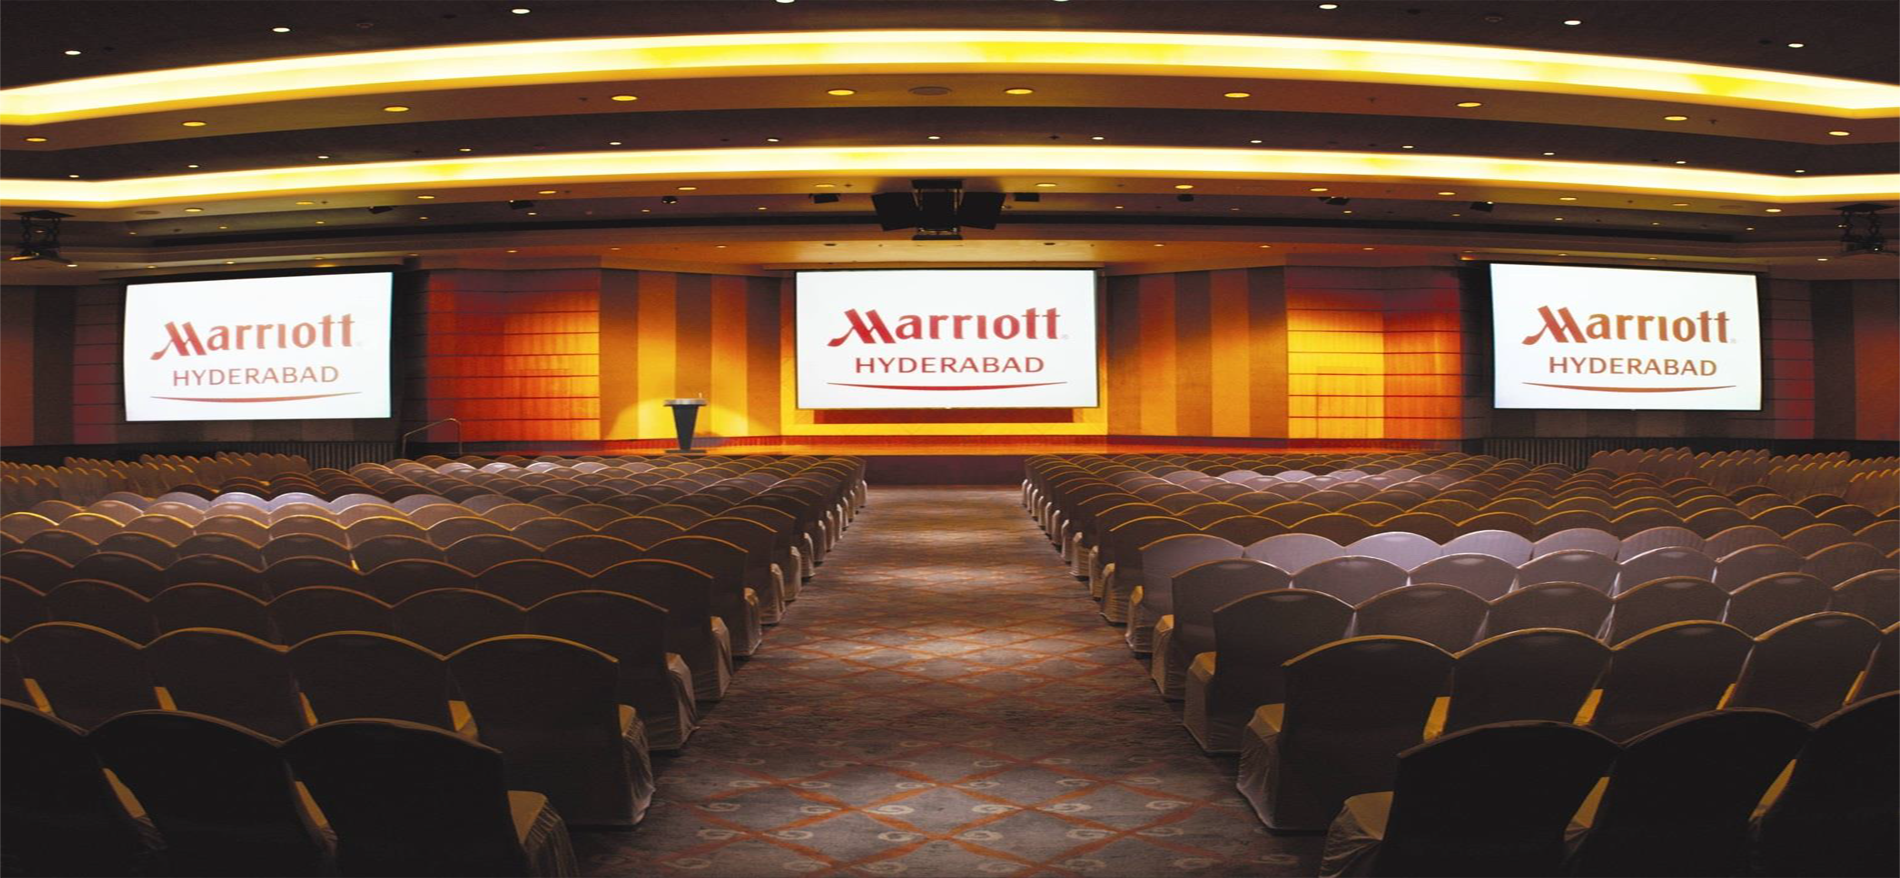 mariott-image